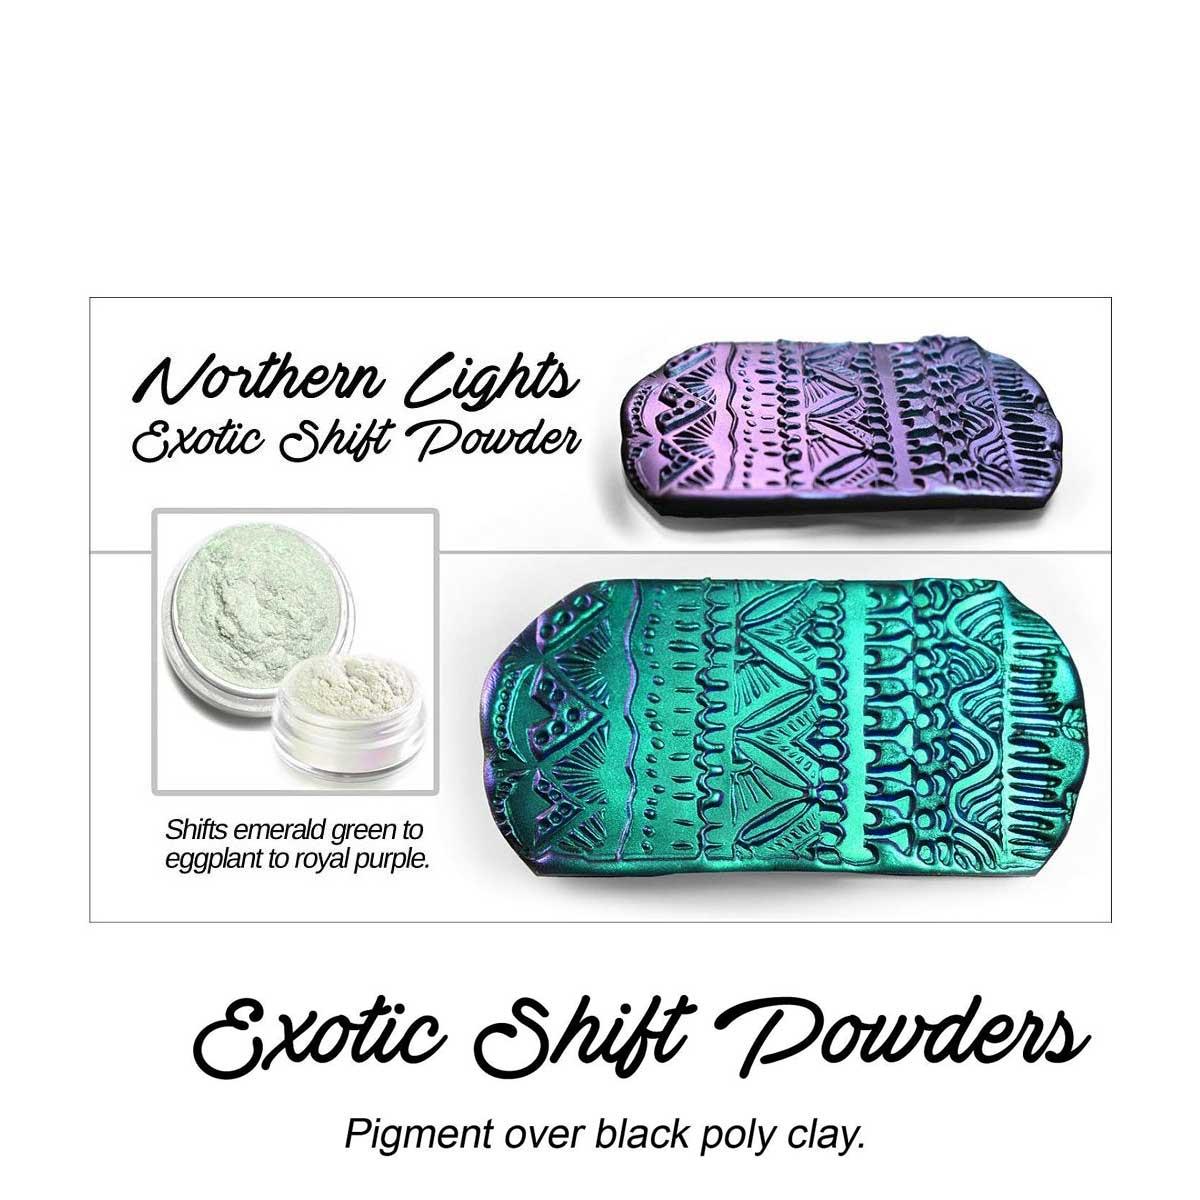 s64356 Creative Art Pigments -  Lumiere Luster Exotics - Northern Lights Exotic (Jar)